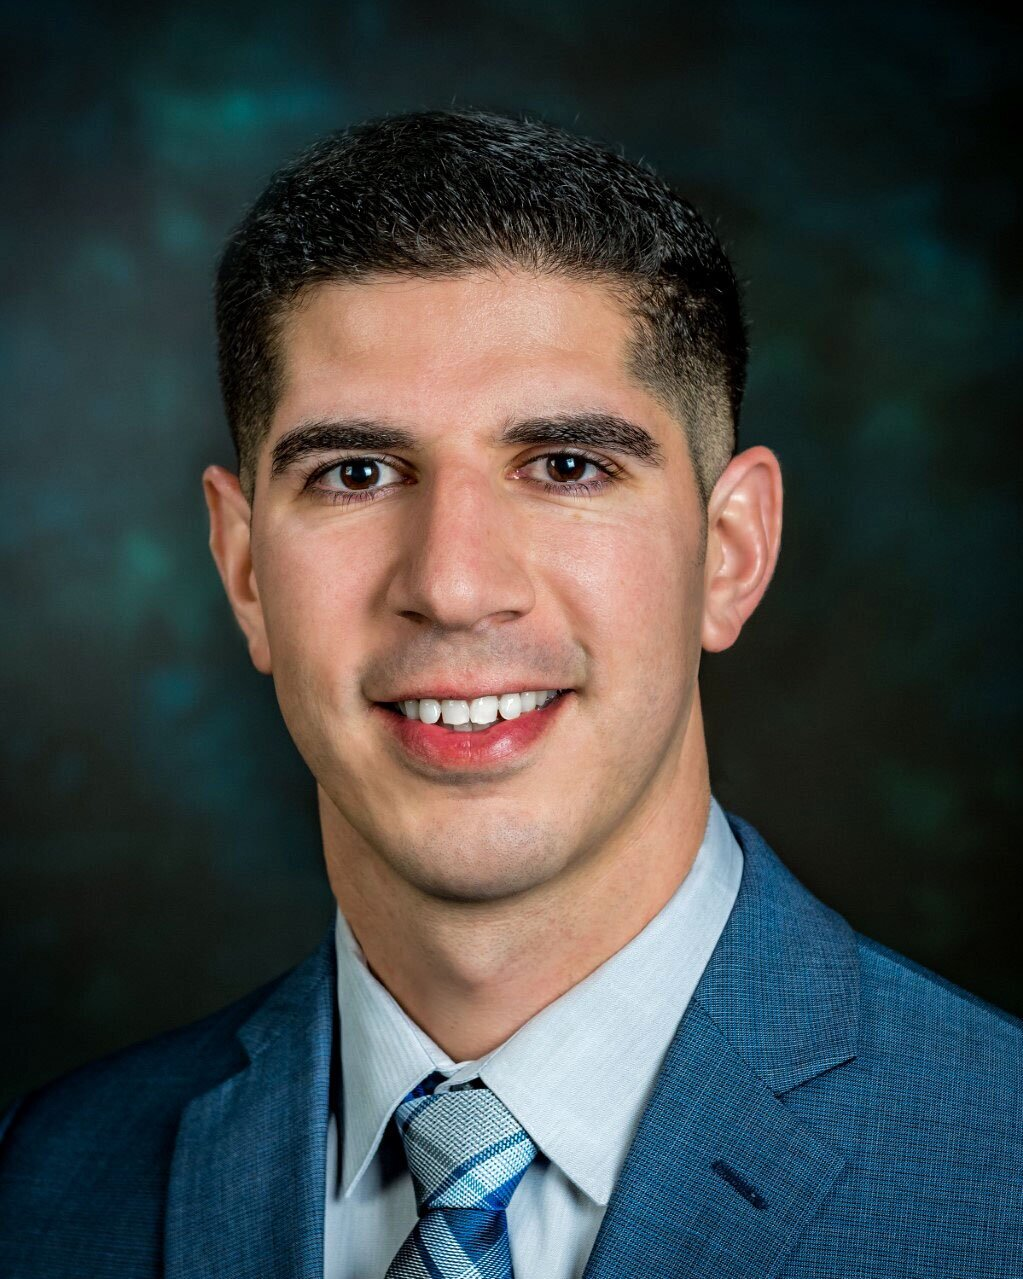 BrianGonzalez - Principal Manufacturing Engineer, F-35 Lightening II Joint Strike Fighter Ctr., Fuselage ProgramNorthrop Grumman Corporation